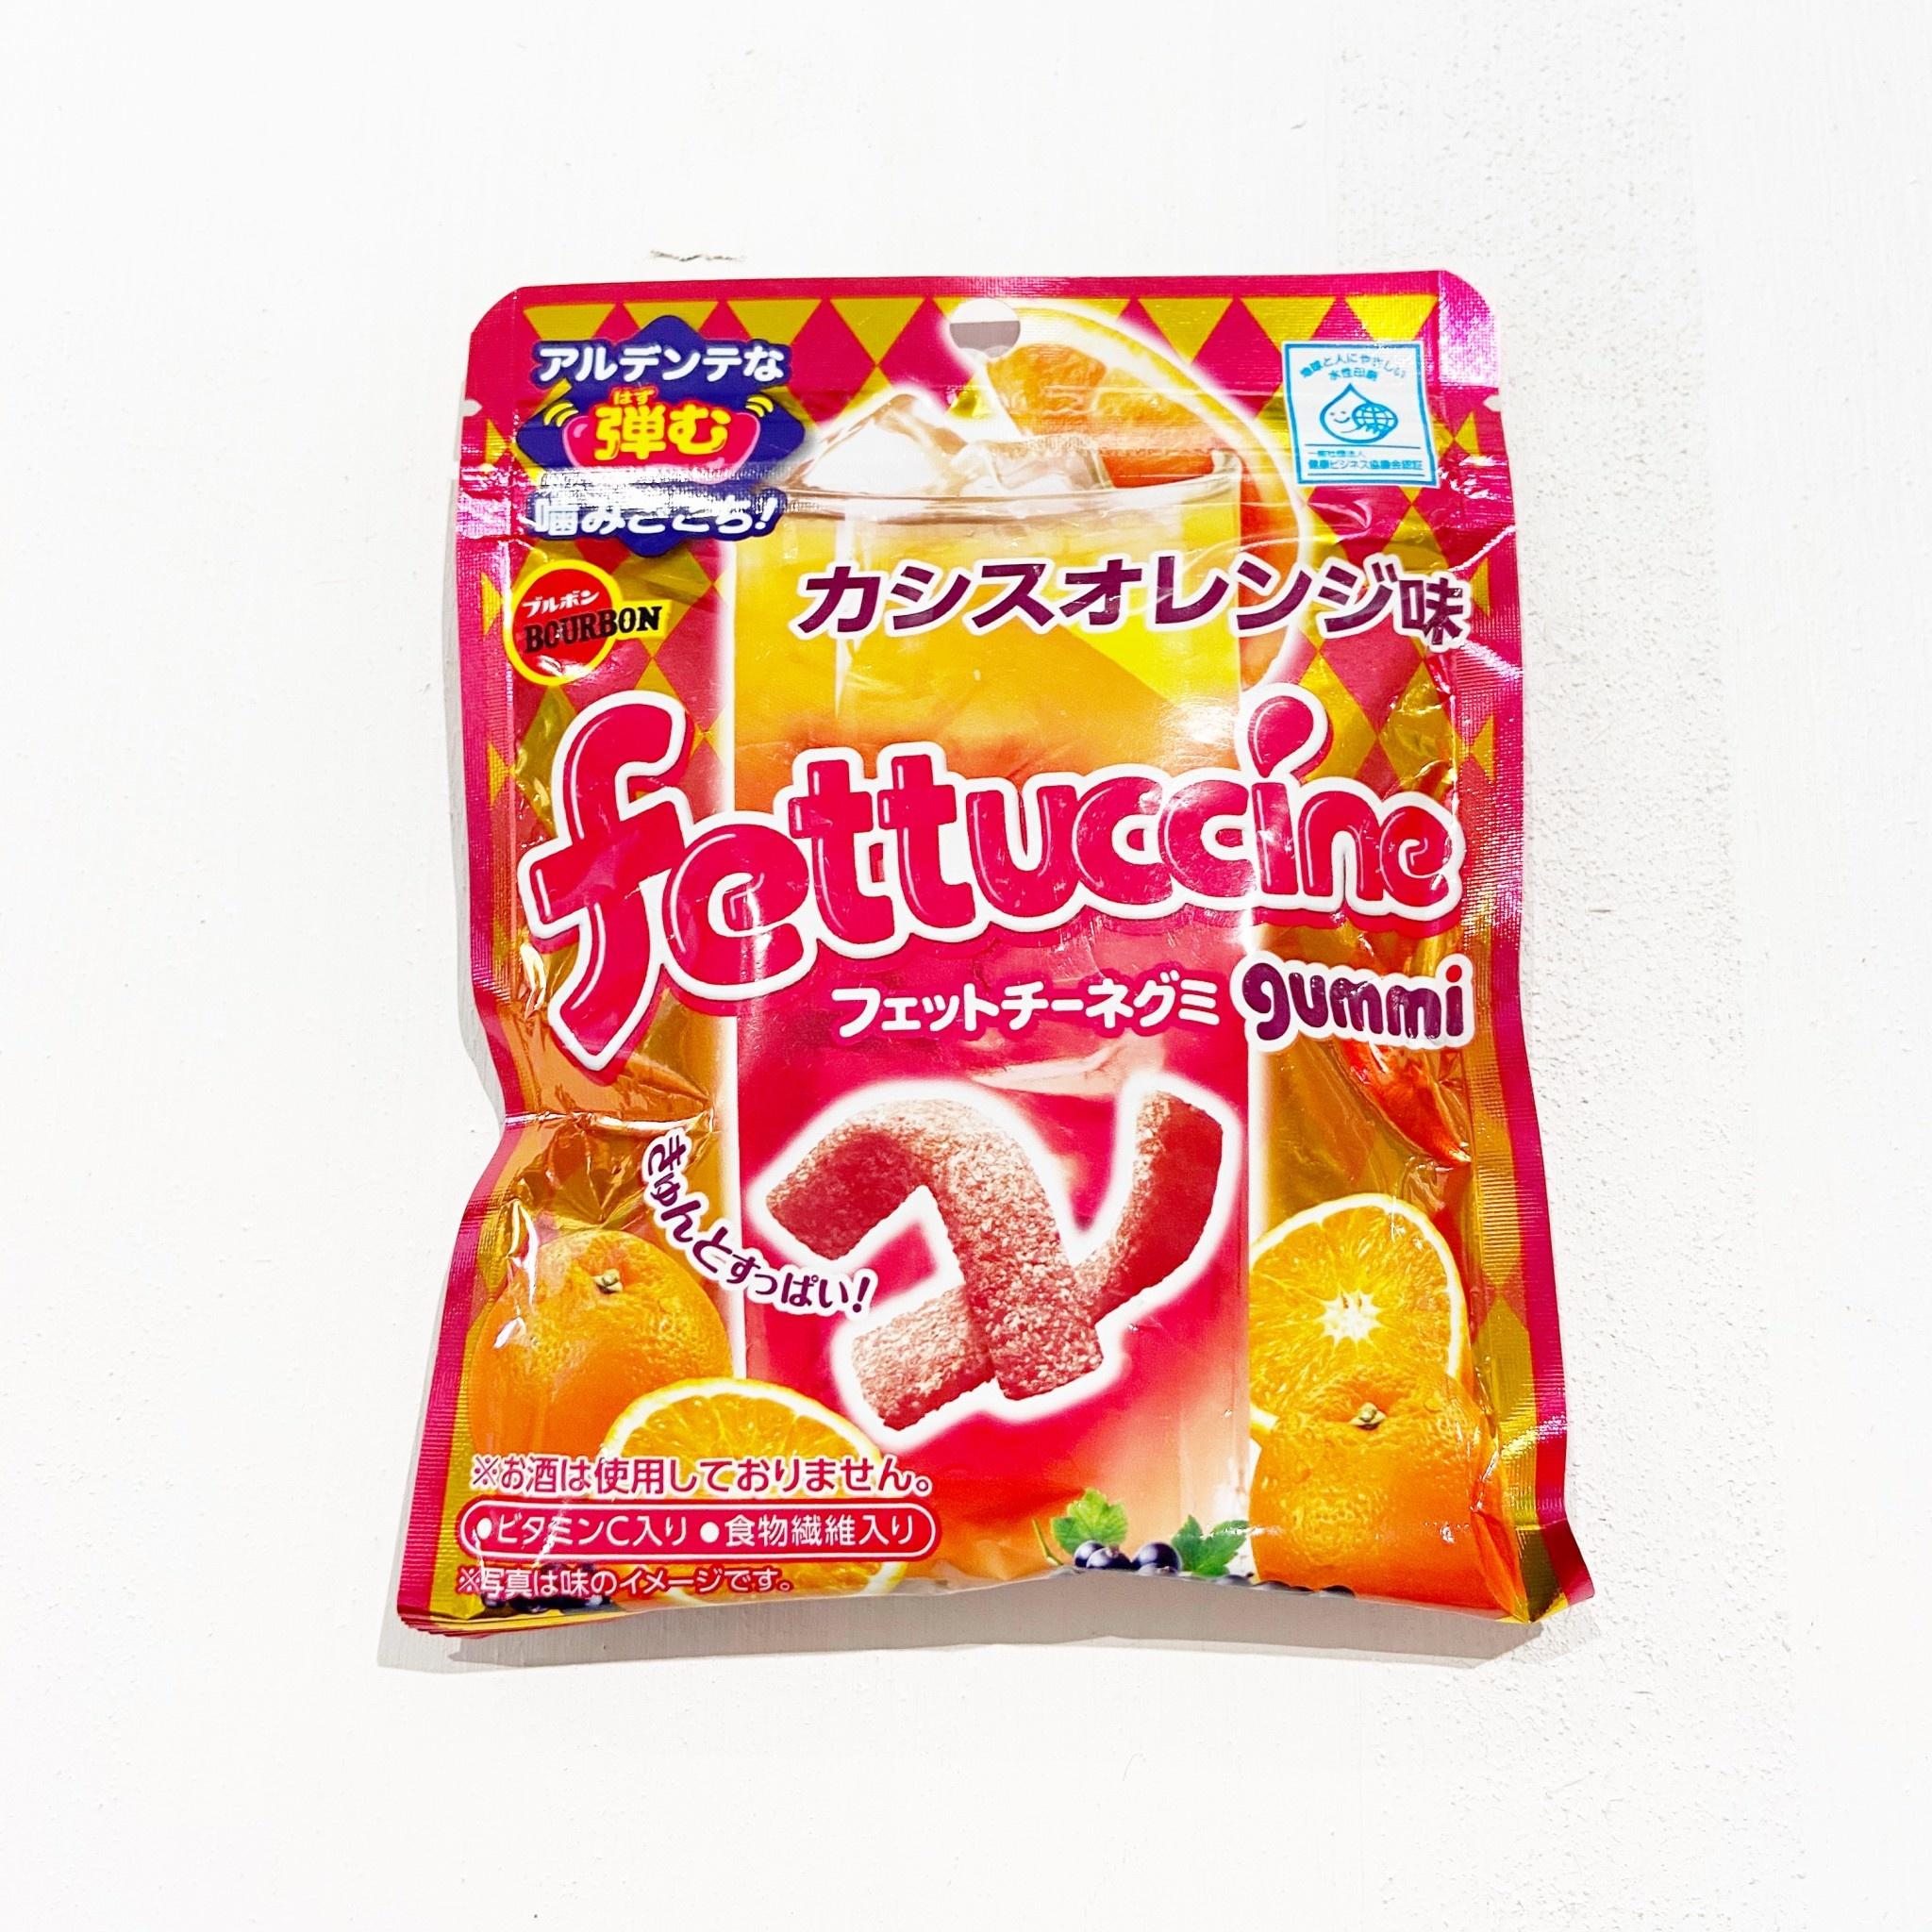 BOURBON Fettuccine Orange Gummy Candy